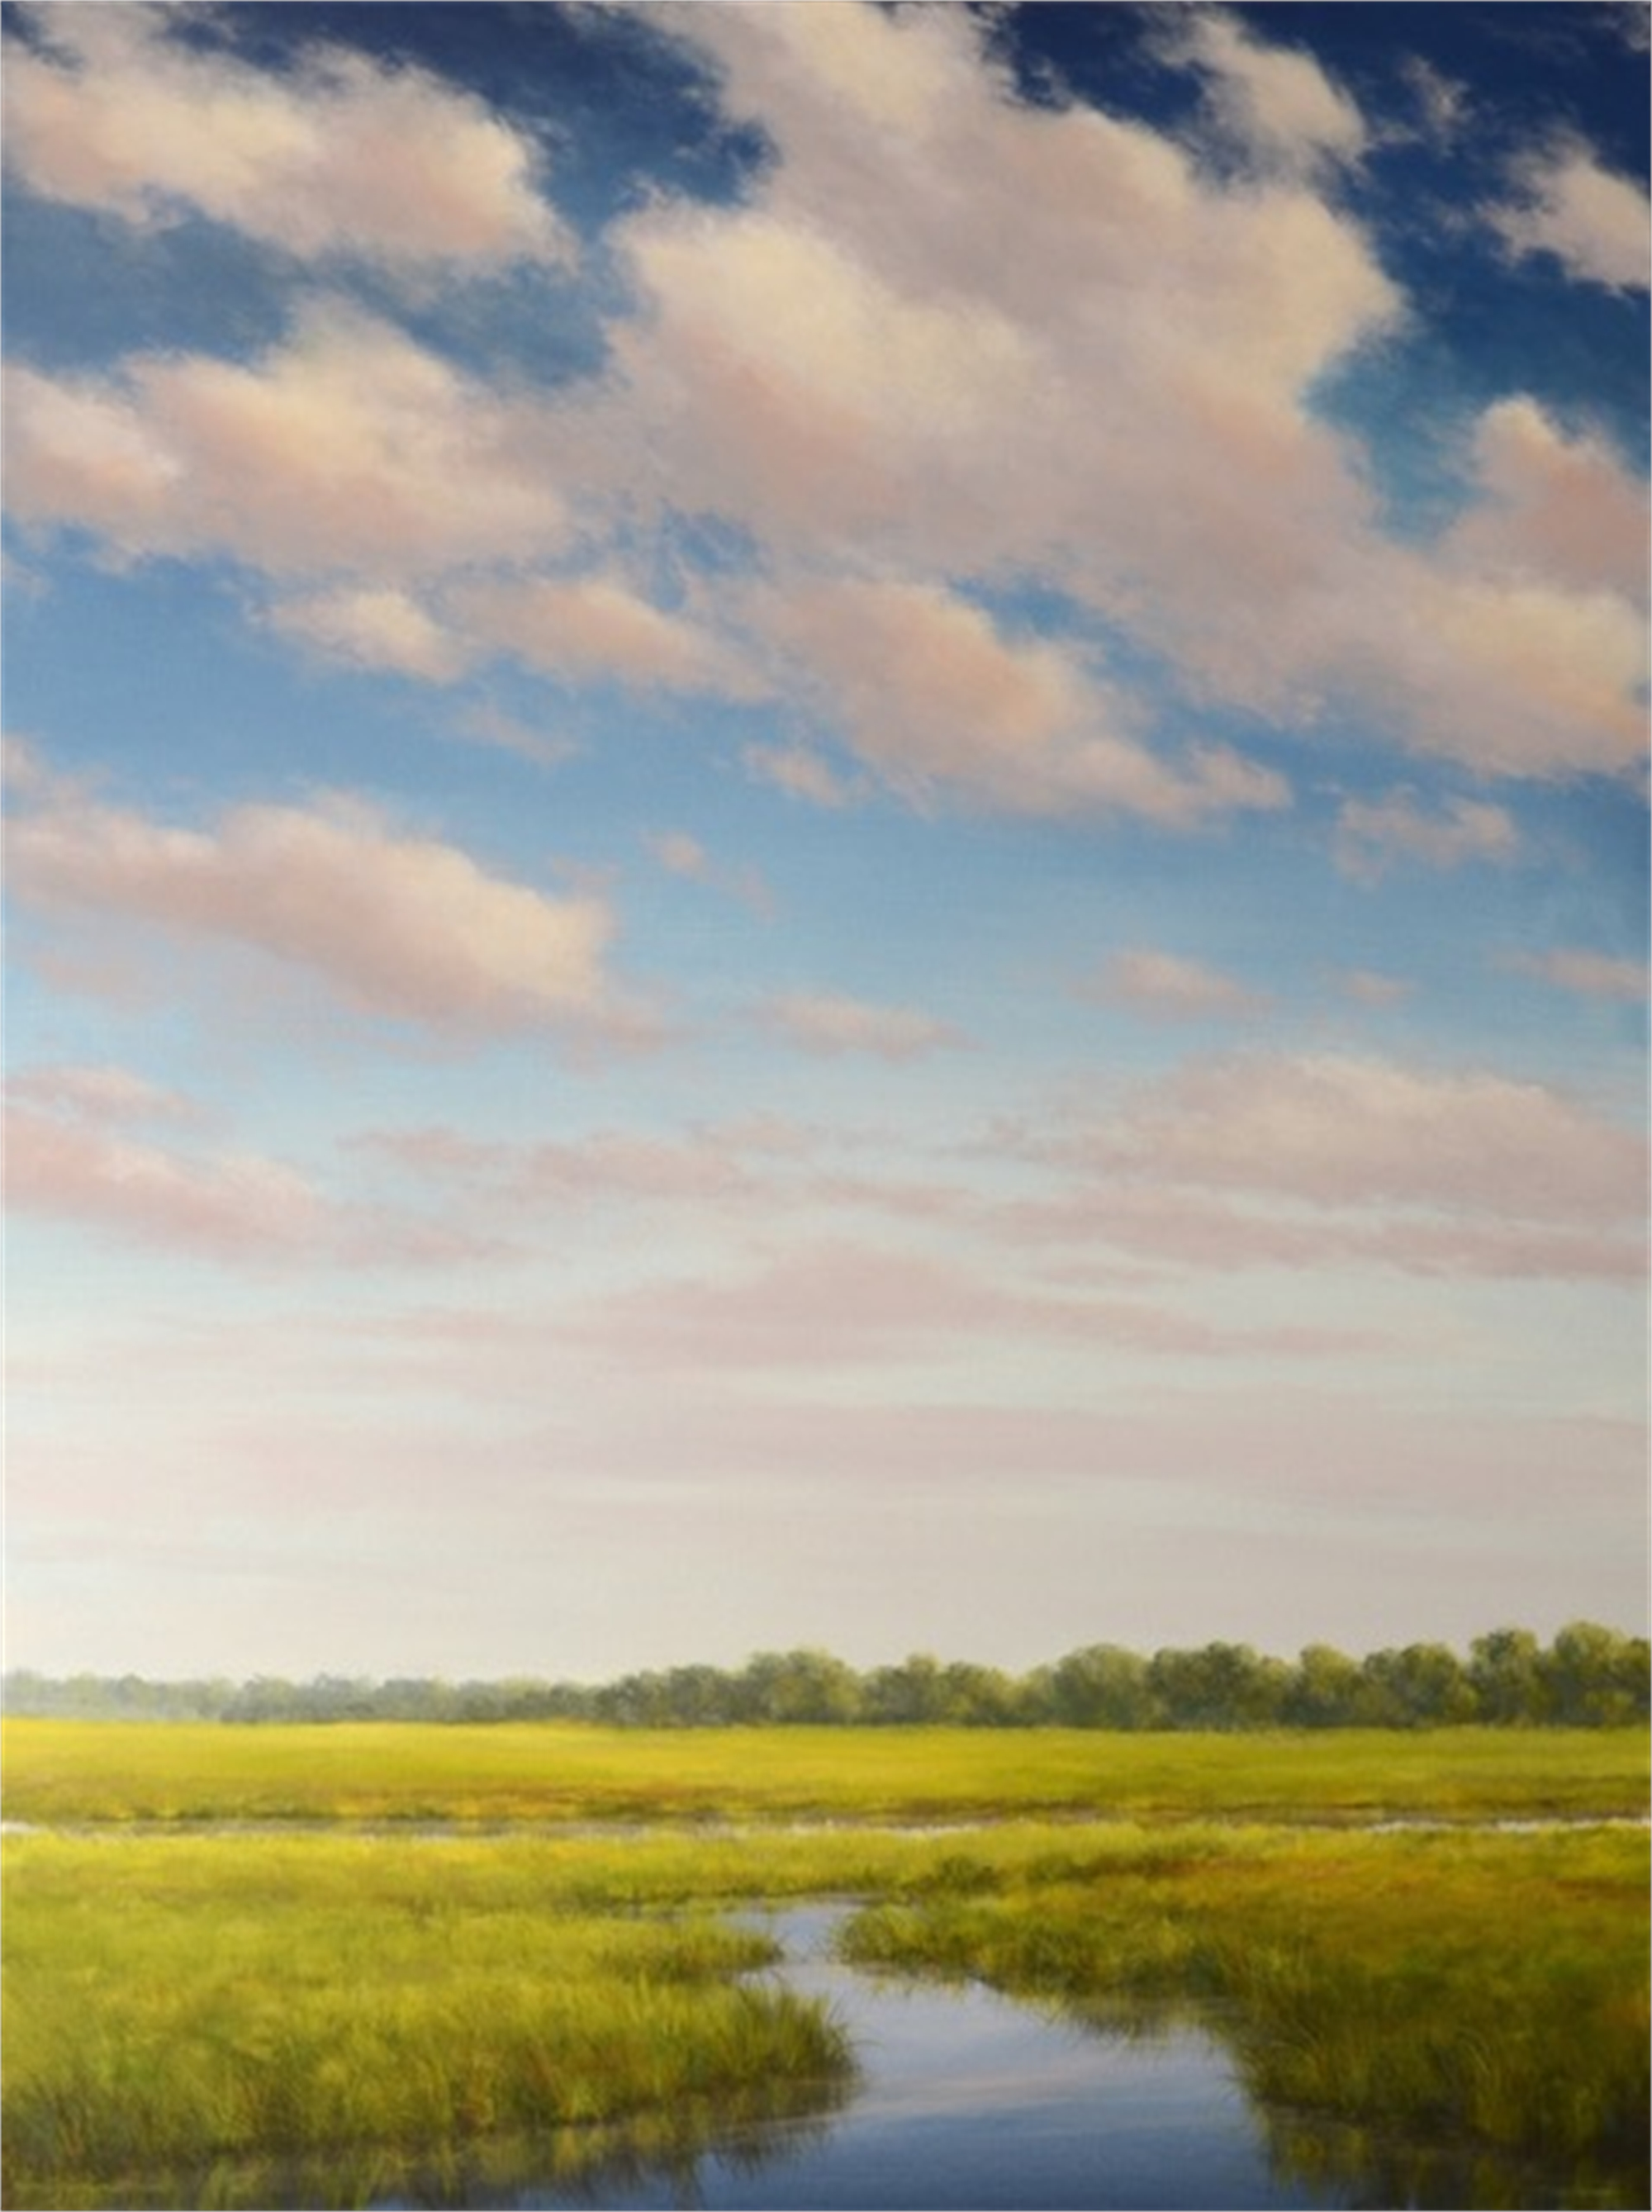 Cedar Island by David Nance